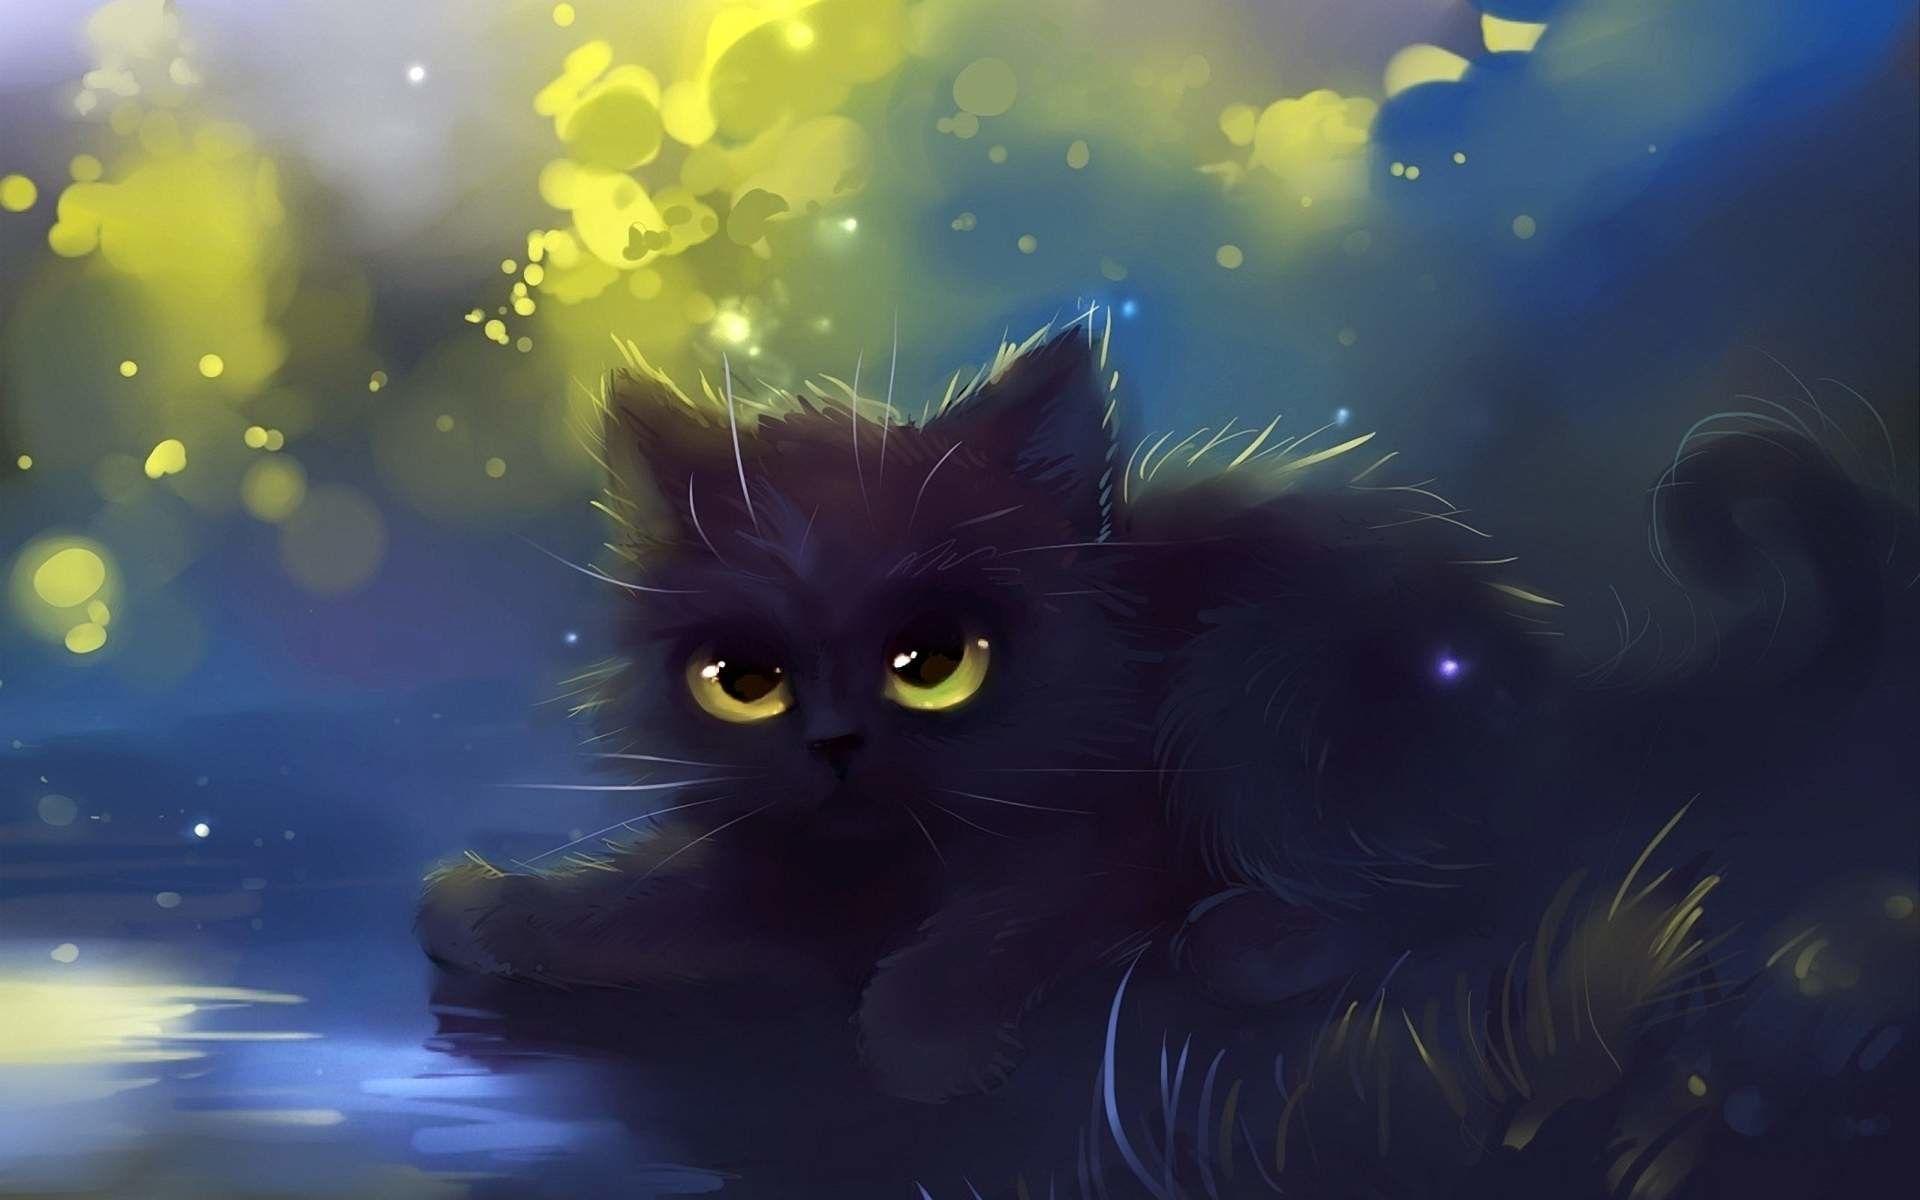 1920x1200 Cartoon Cat Wallpaper Black Cat Painting Black Cat